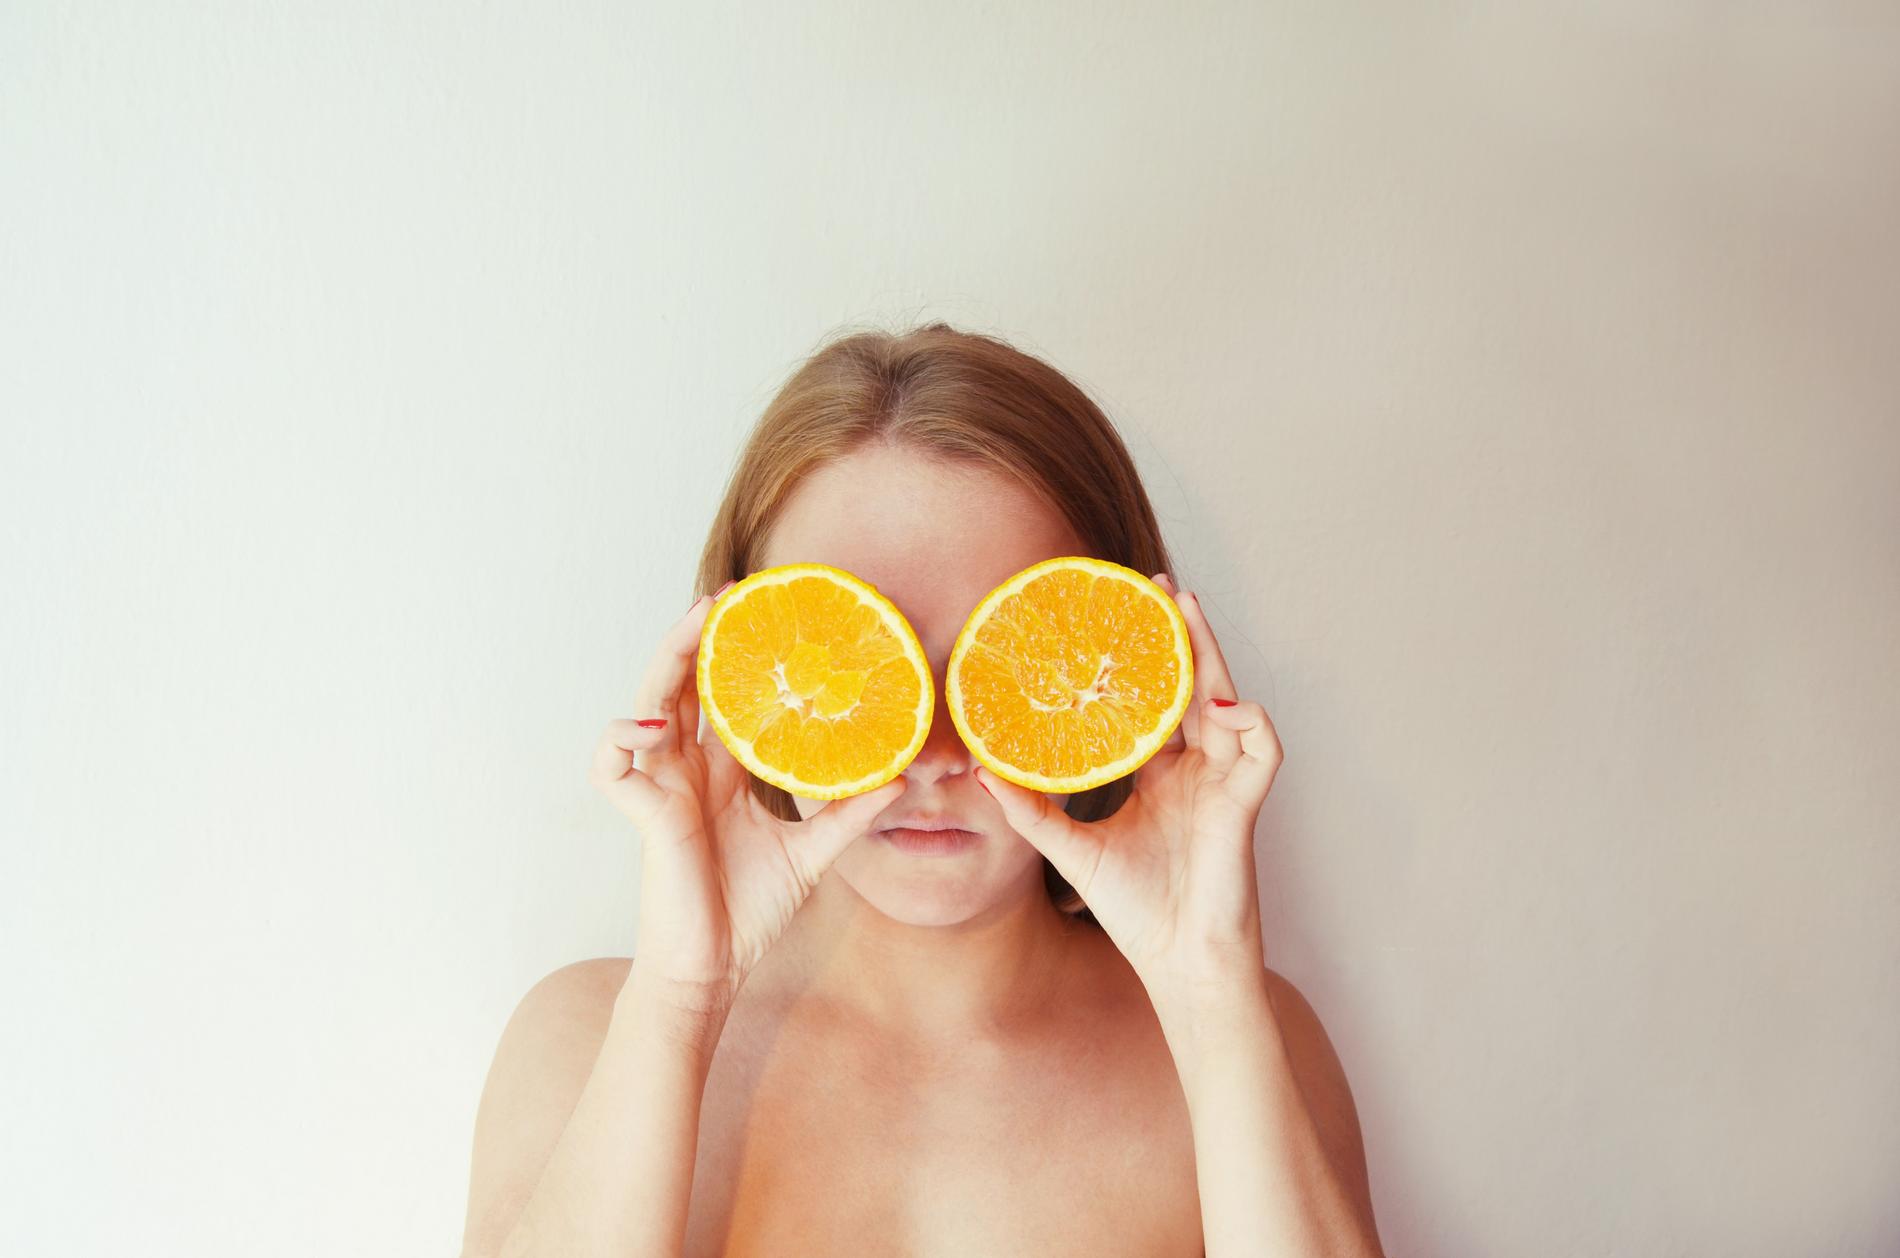 Autoportrét 2014 Pomeranče